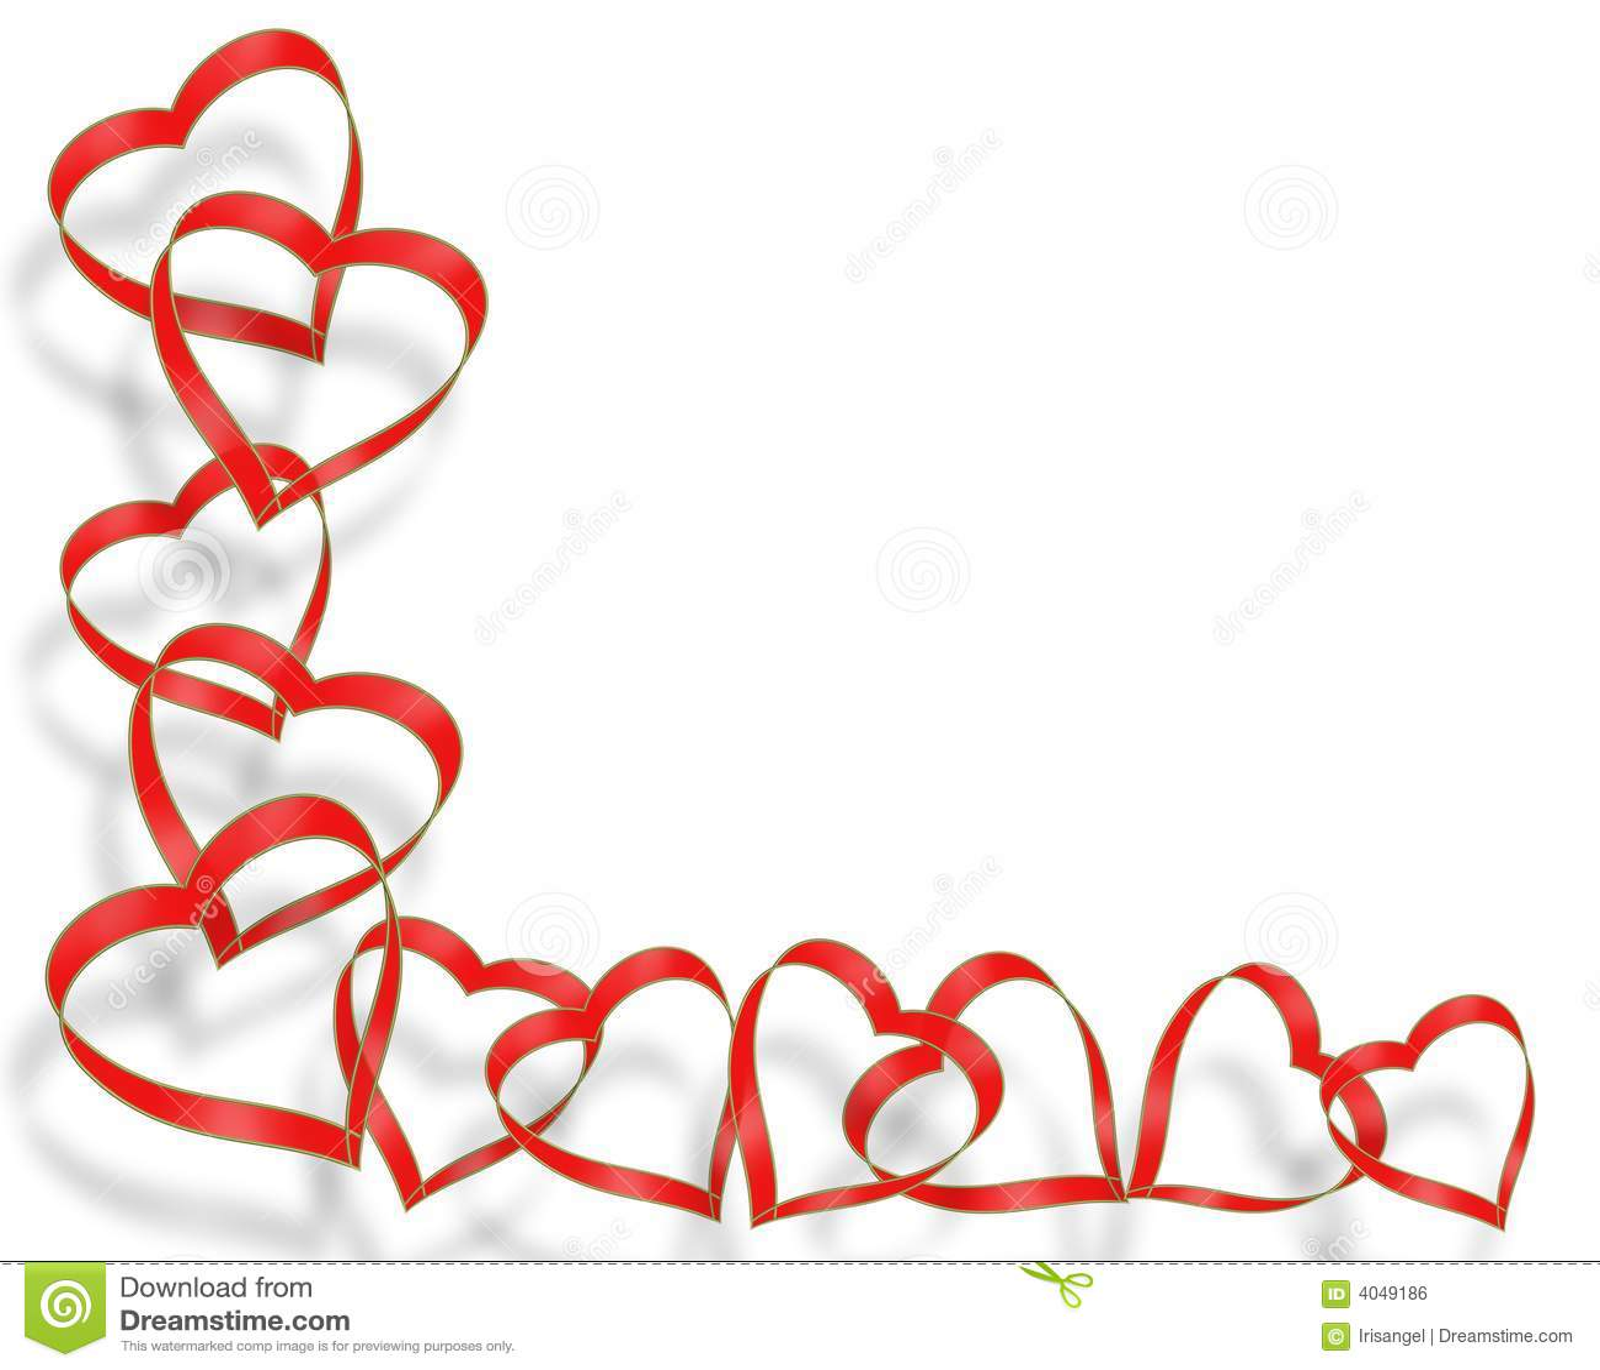 Valentines Day Border Royalty Free Stock Image - Image: 4049186